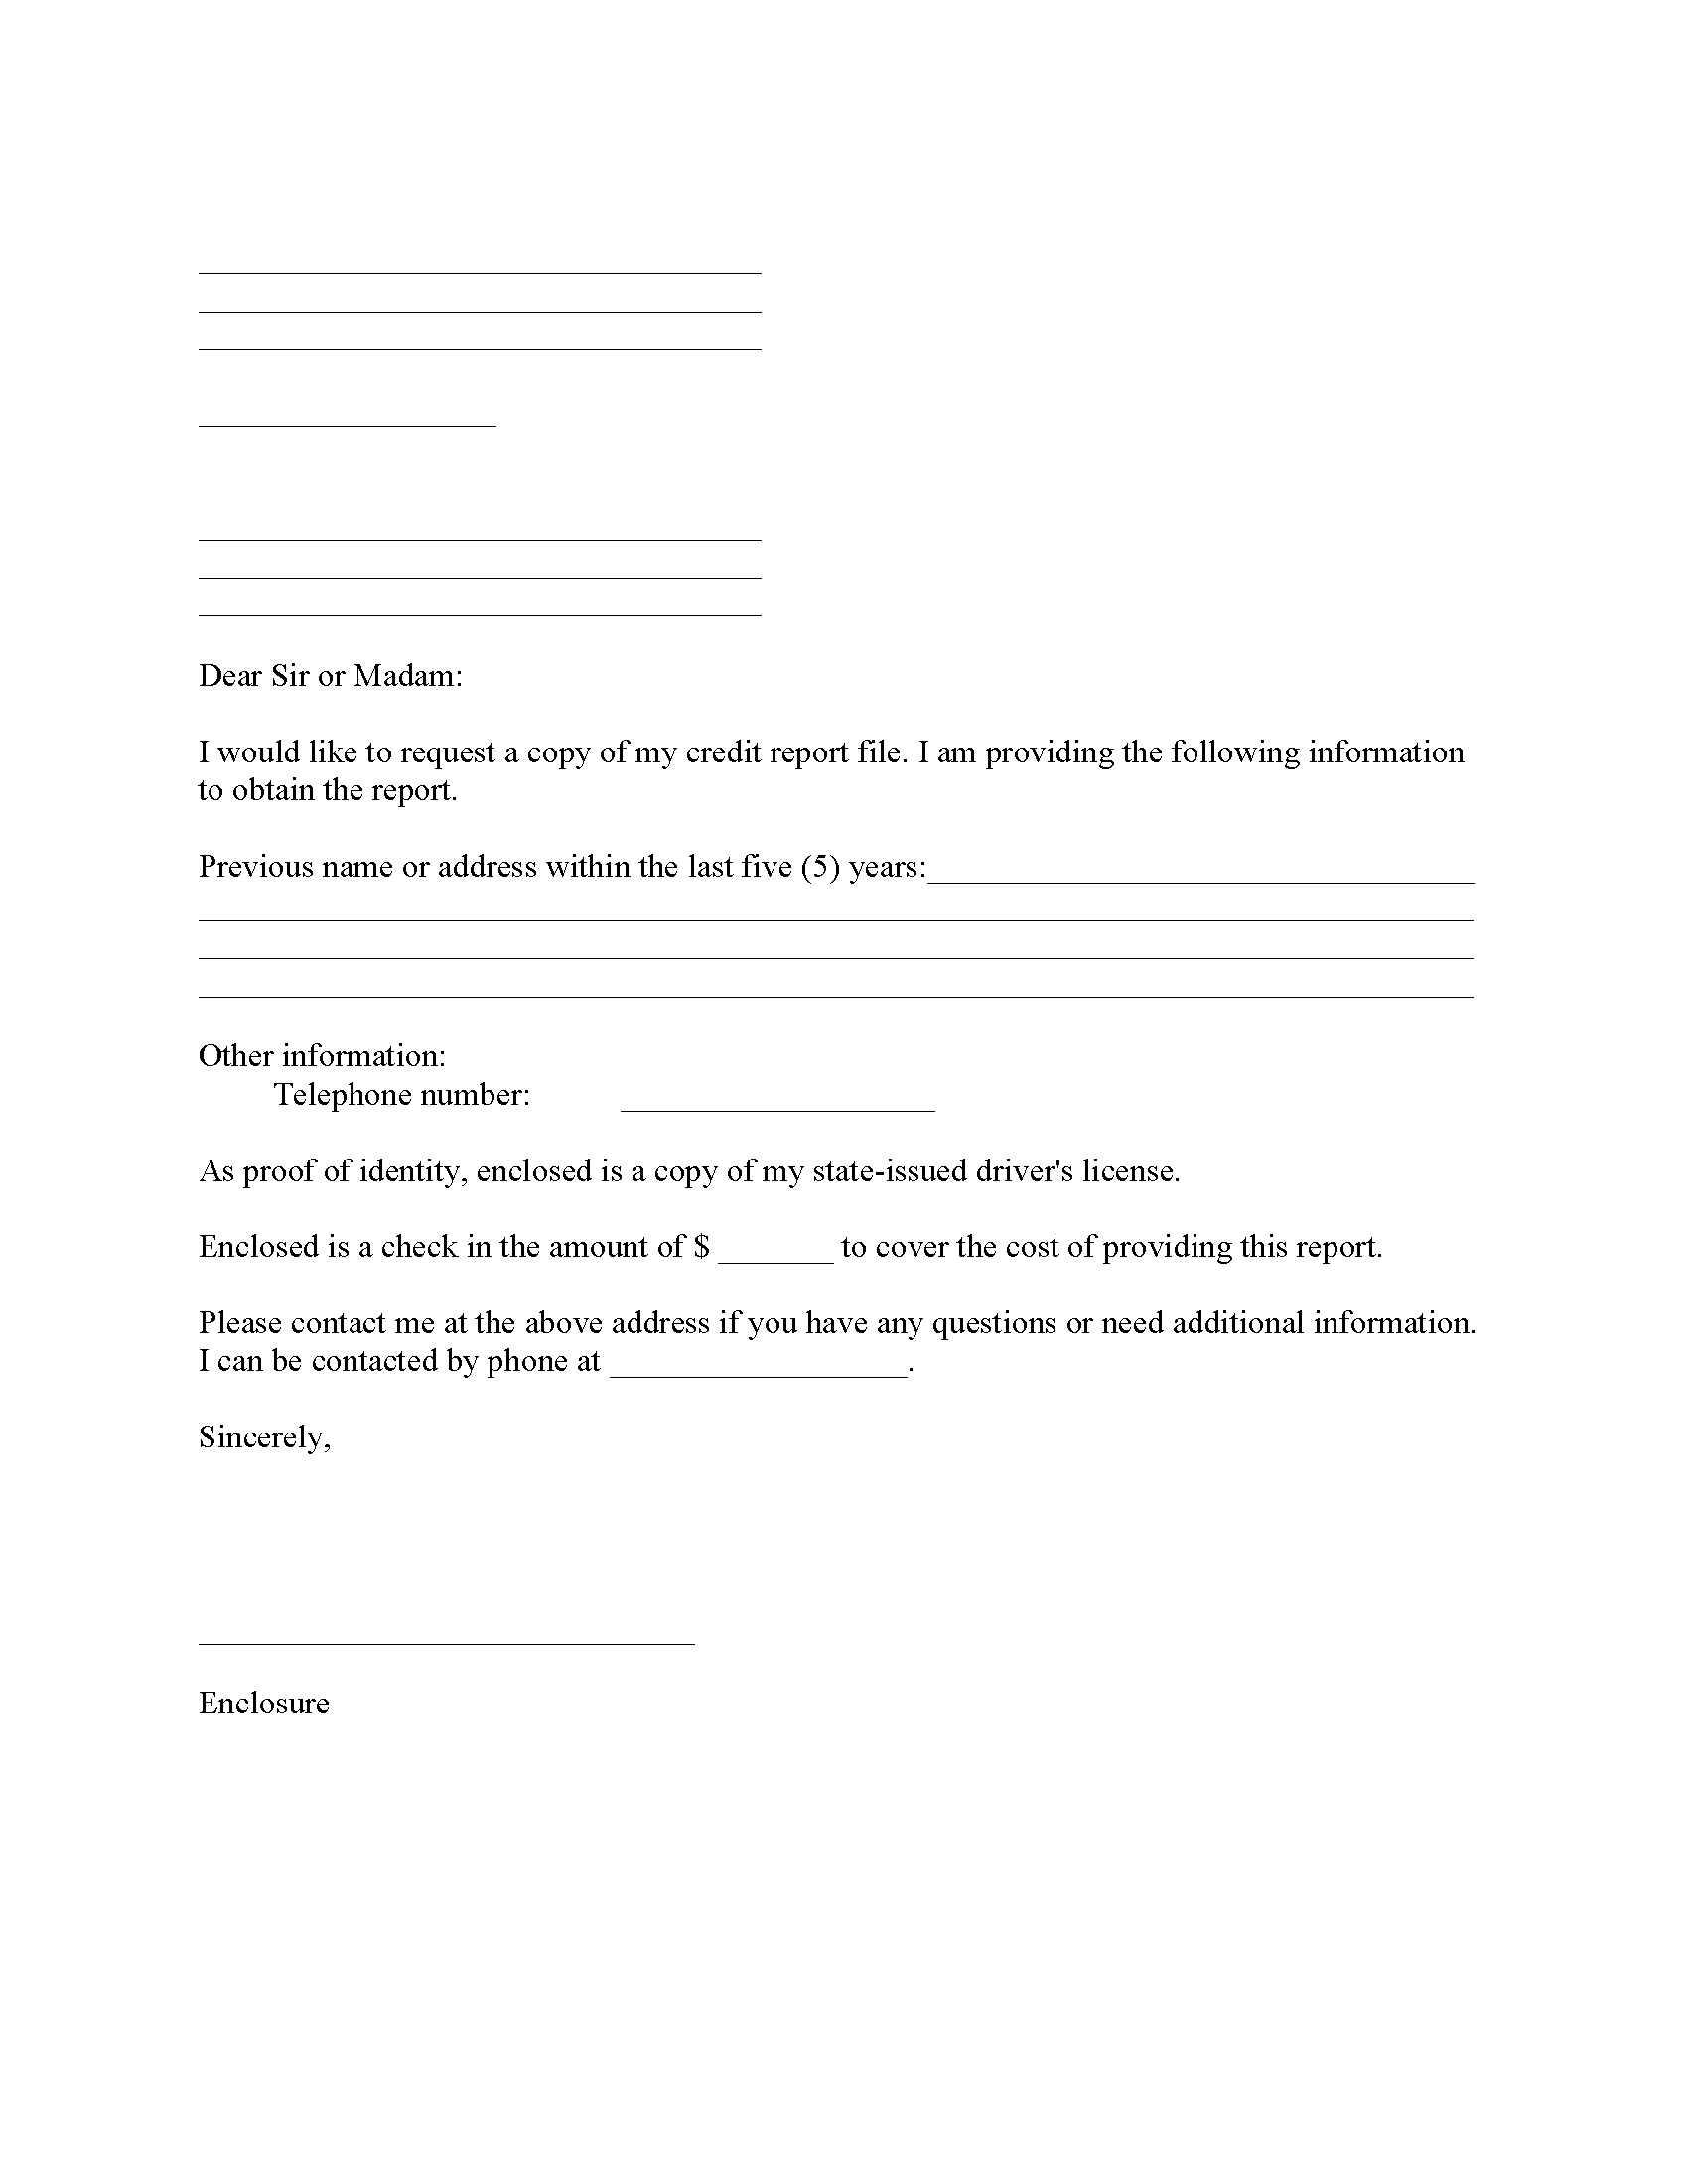 Credit Report Request Form